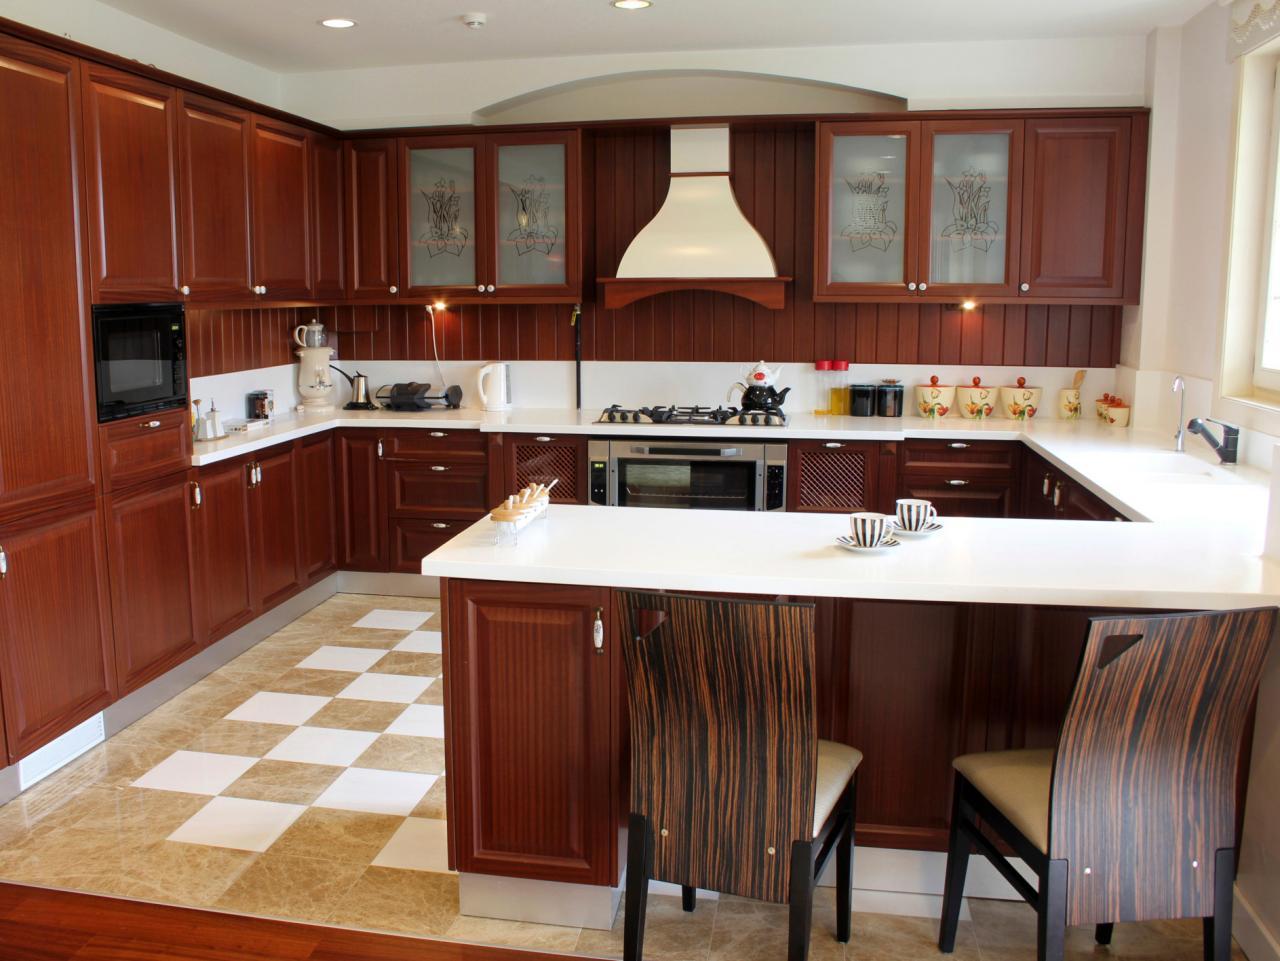 u shaped kitchen layout with island u-shaped kitchens MLJKRHG